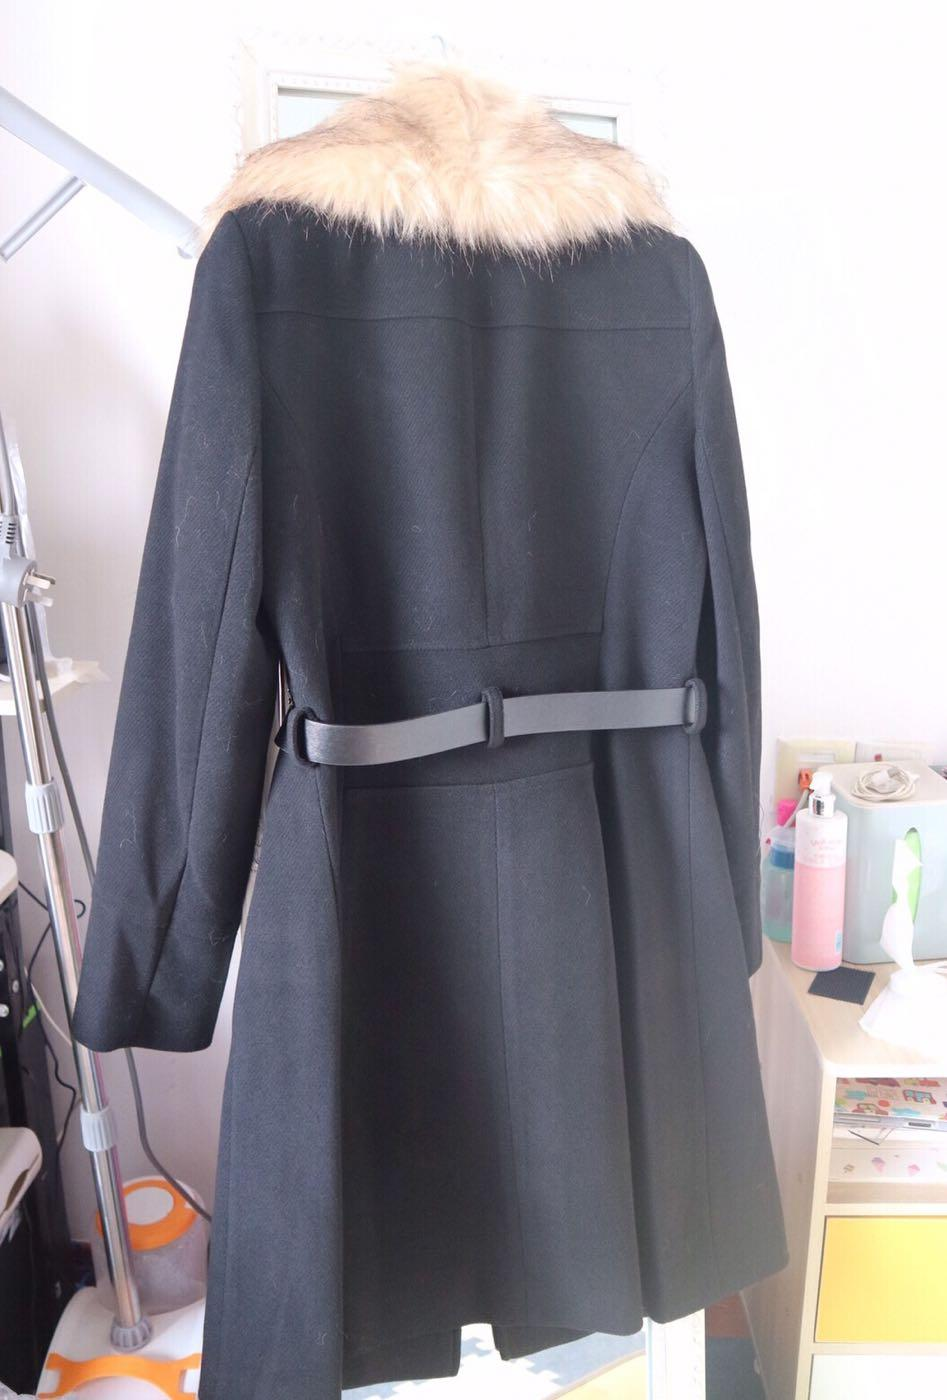 BNWT Miss Selfridge faux fur coat